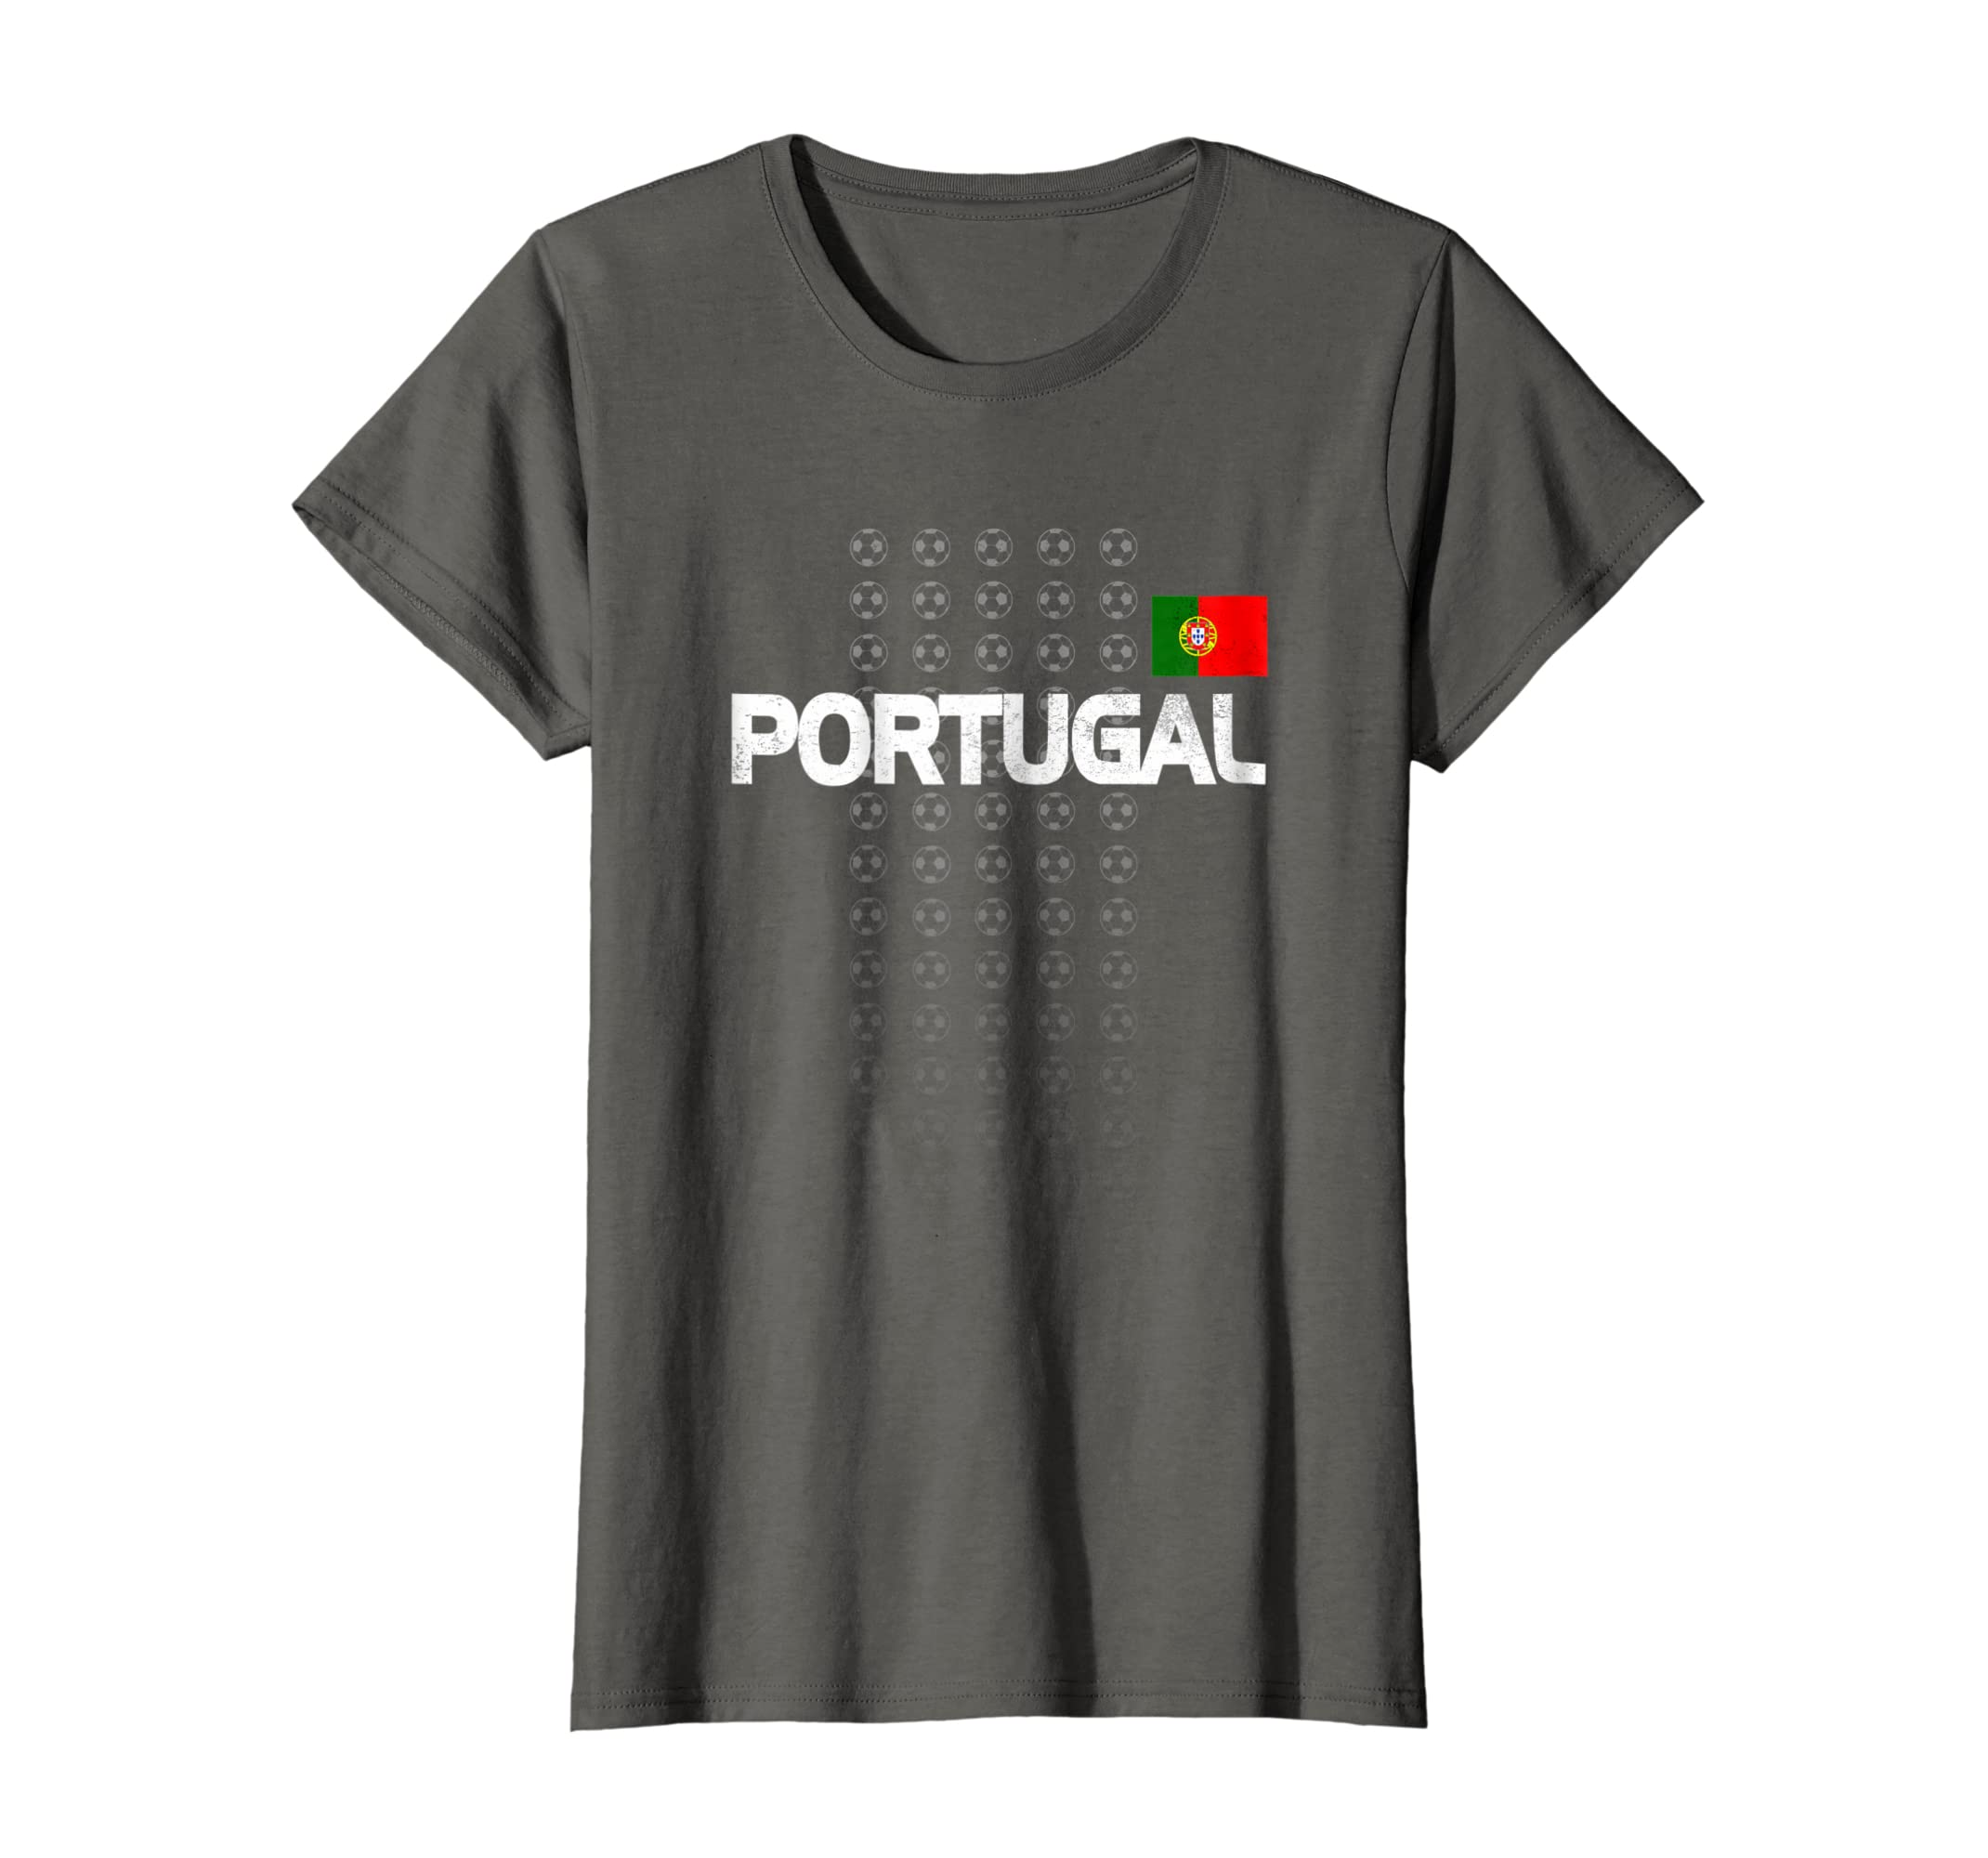 4f9245350d2 Amazon.com: Portugal soccer Shirt - Portuguese National Team Fan Top:  Clothing